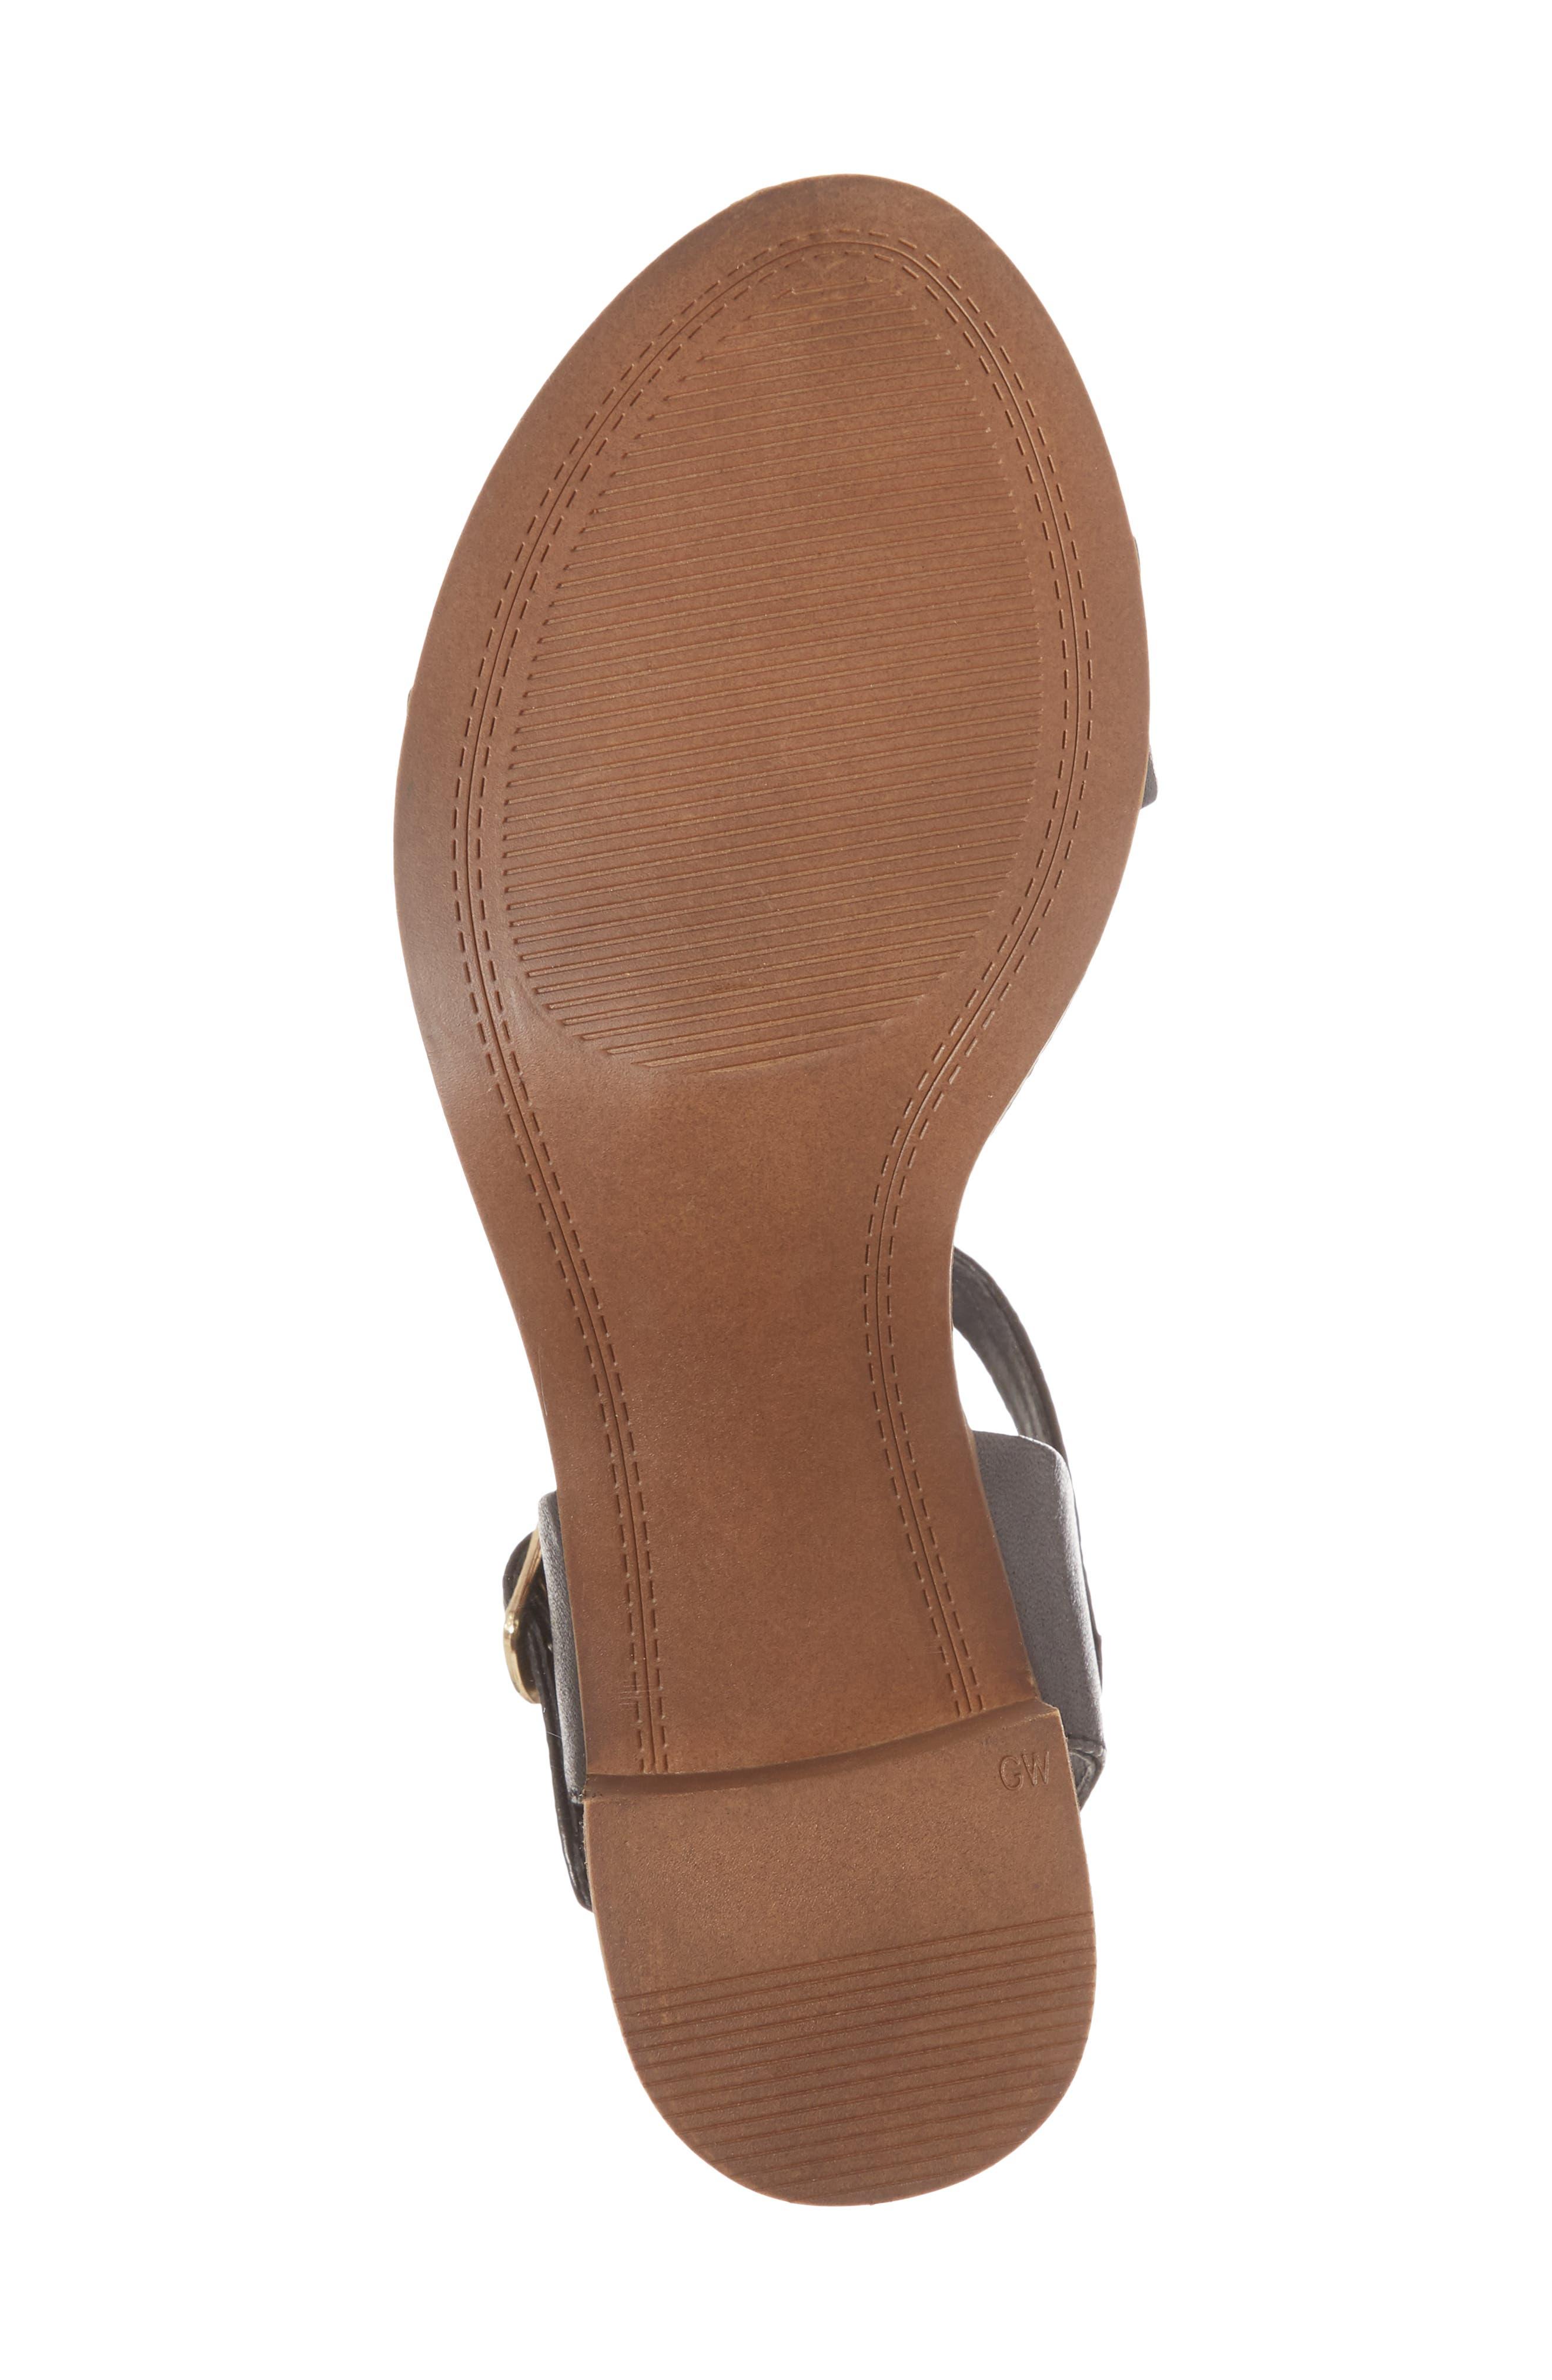 April Block Heel Sandal,                             Alternate thumbnail 6, color,                             BLACK LEATHER